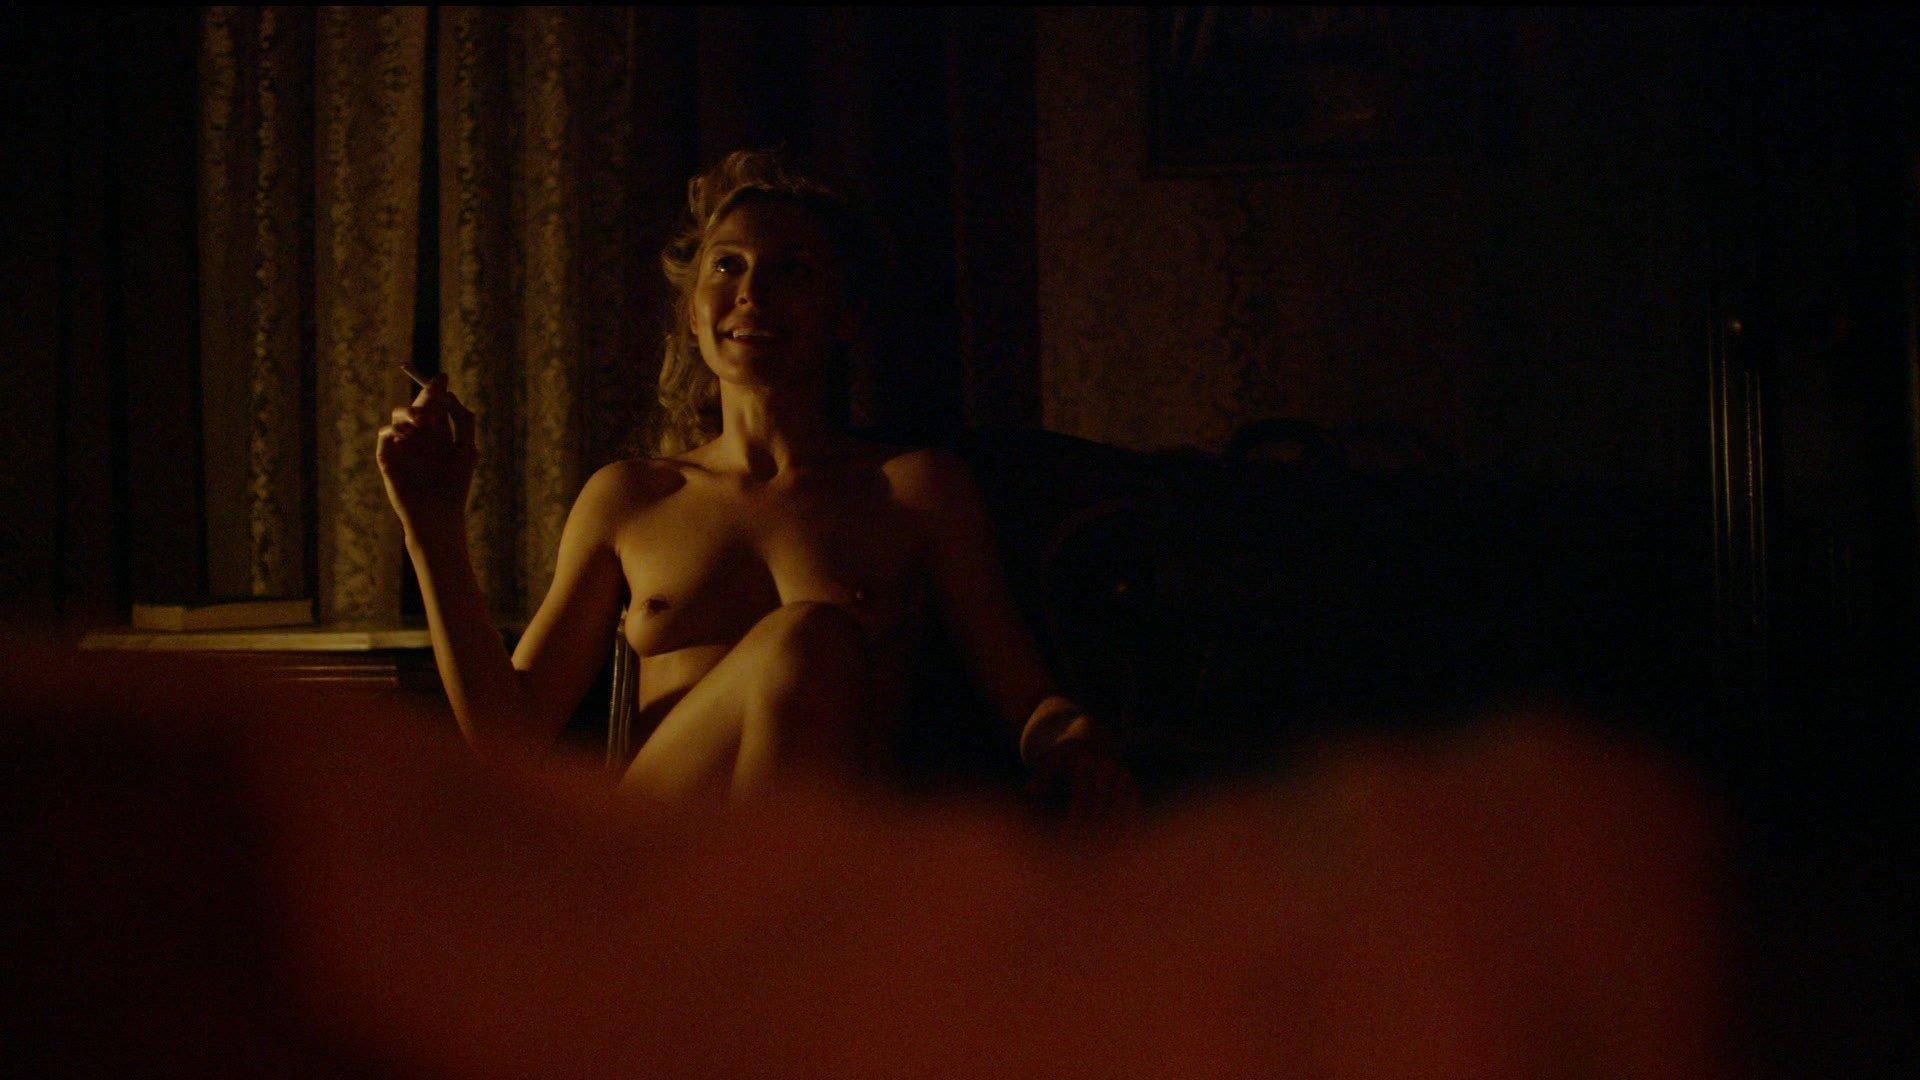 Juliet rylance nude